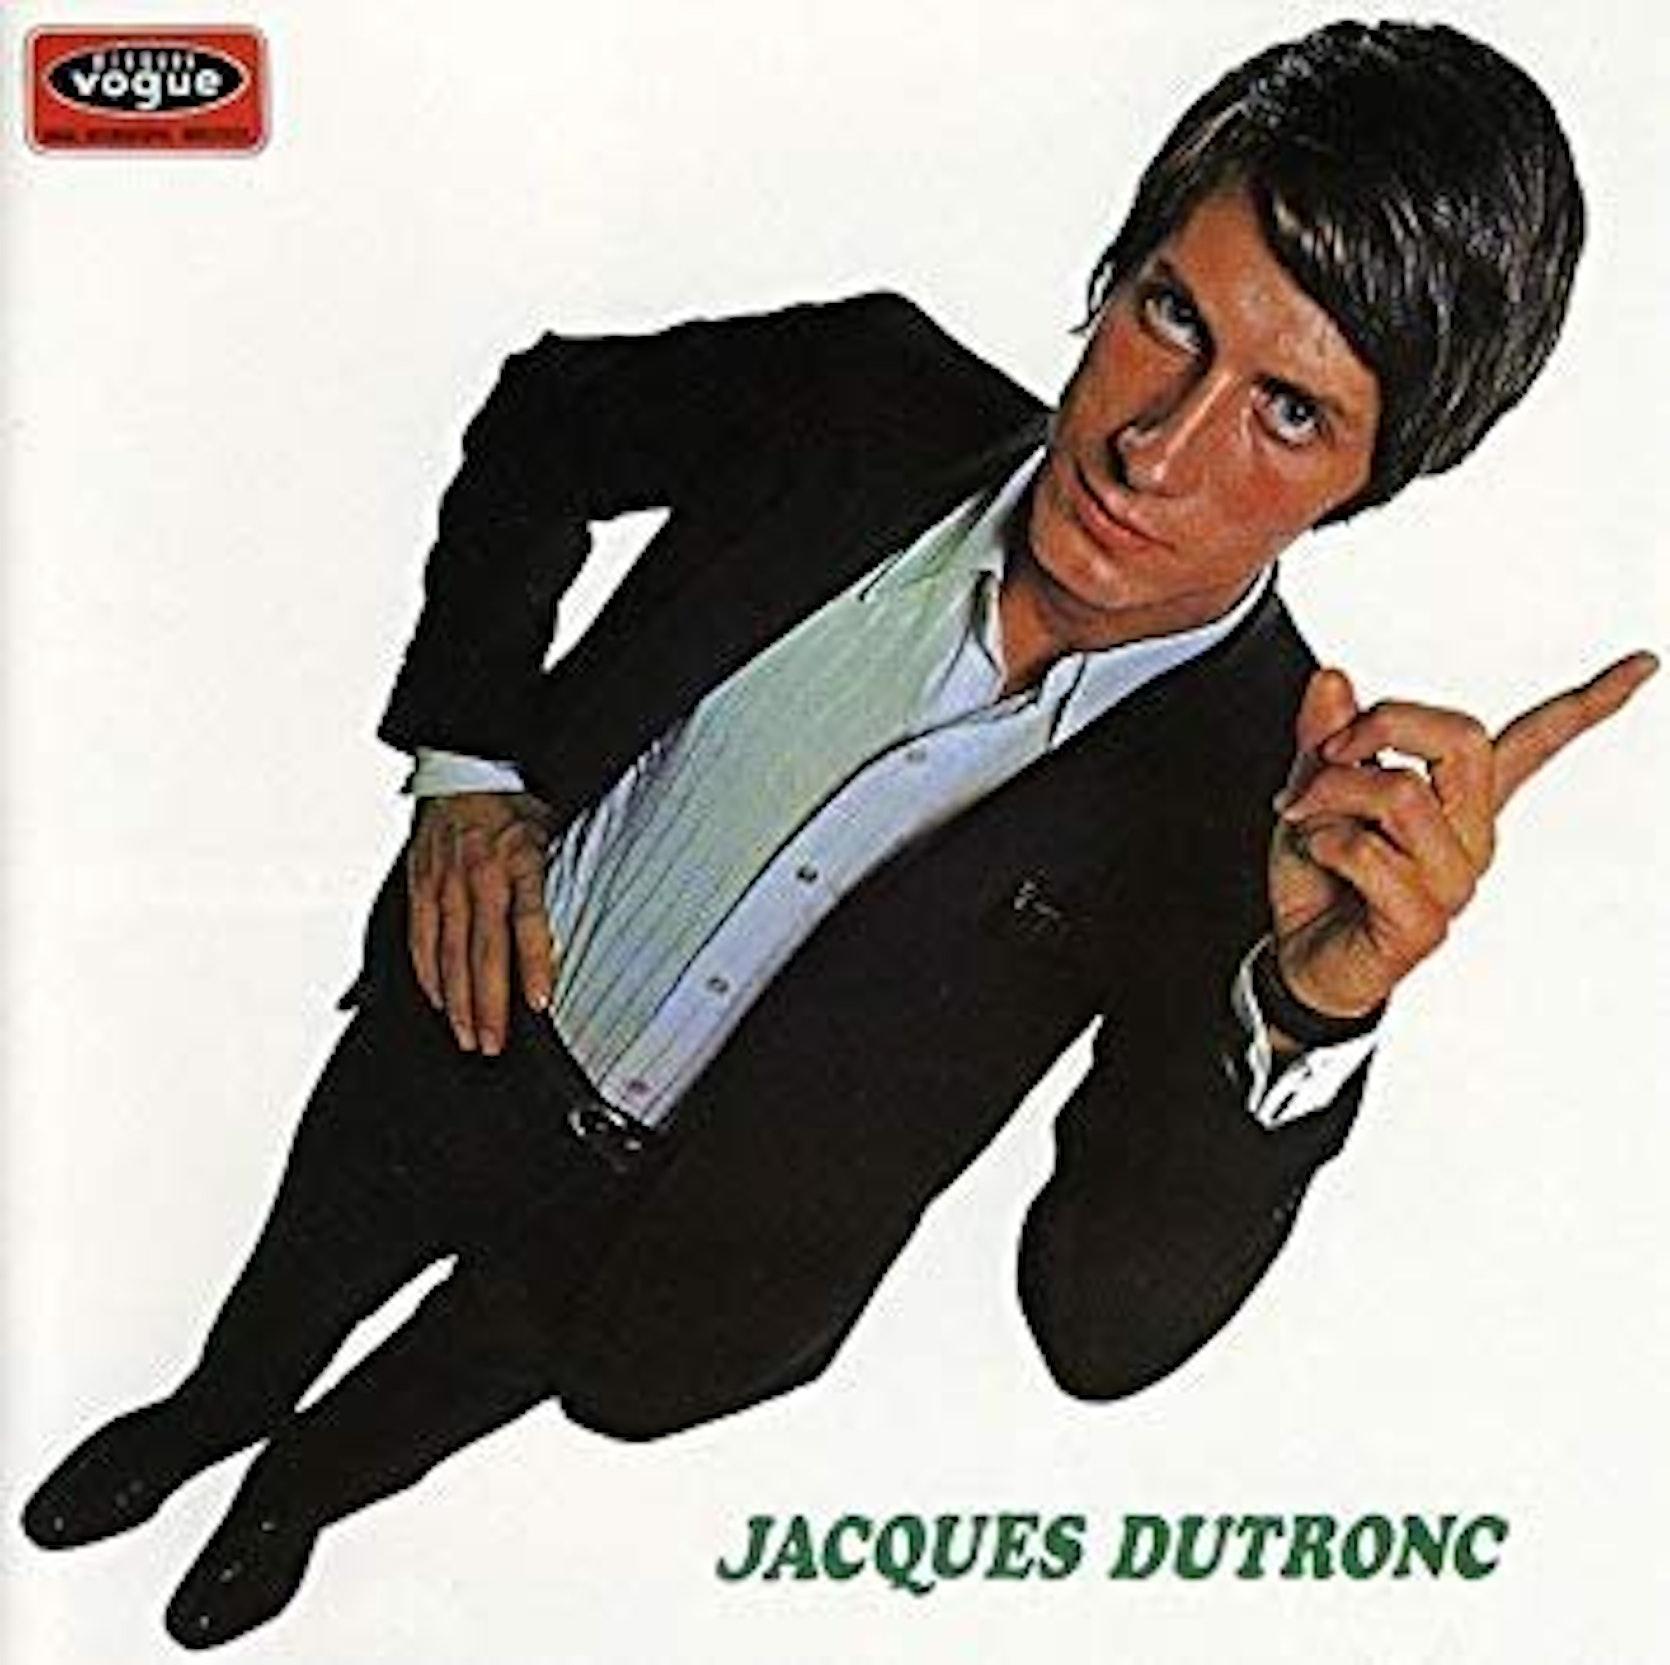 The 10 Best French Yé-Yé Pop Albums To Own On Vinyl — Vinyl Me, Please